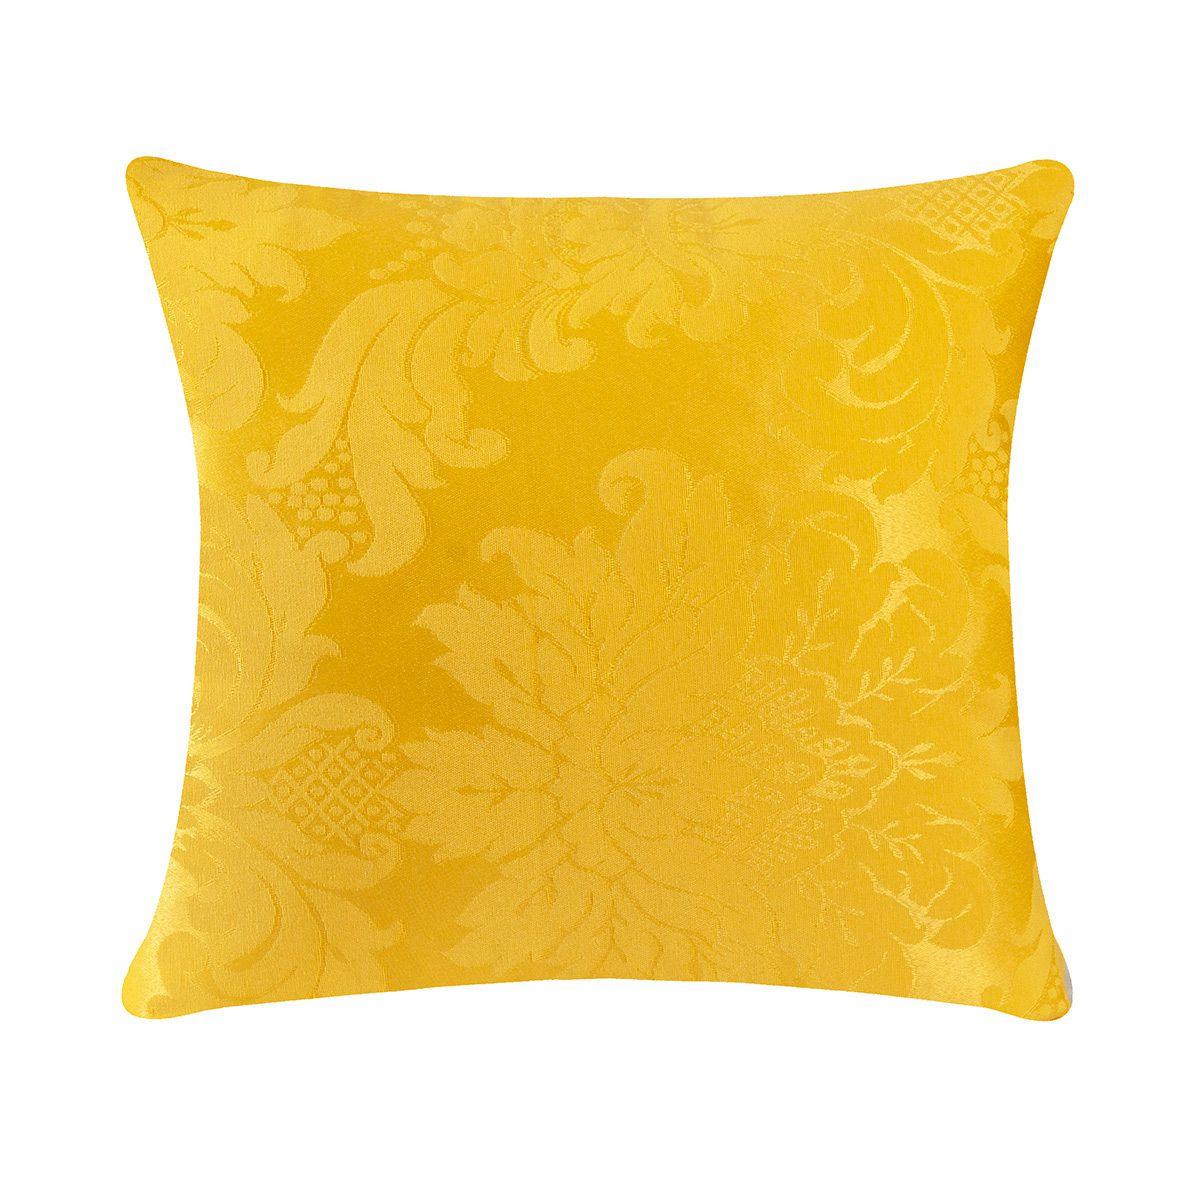 Capa de Almofada Jacquard Avulsa Amarelo 42cm x 42cm